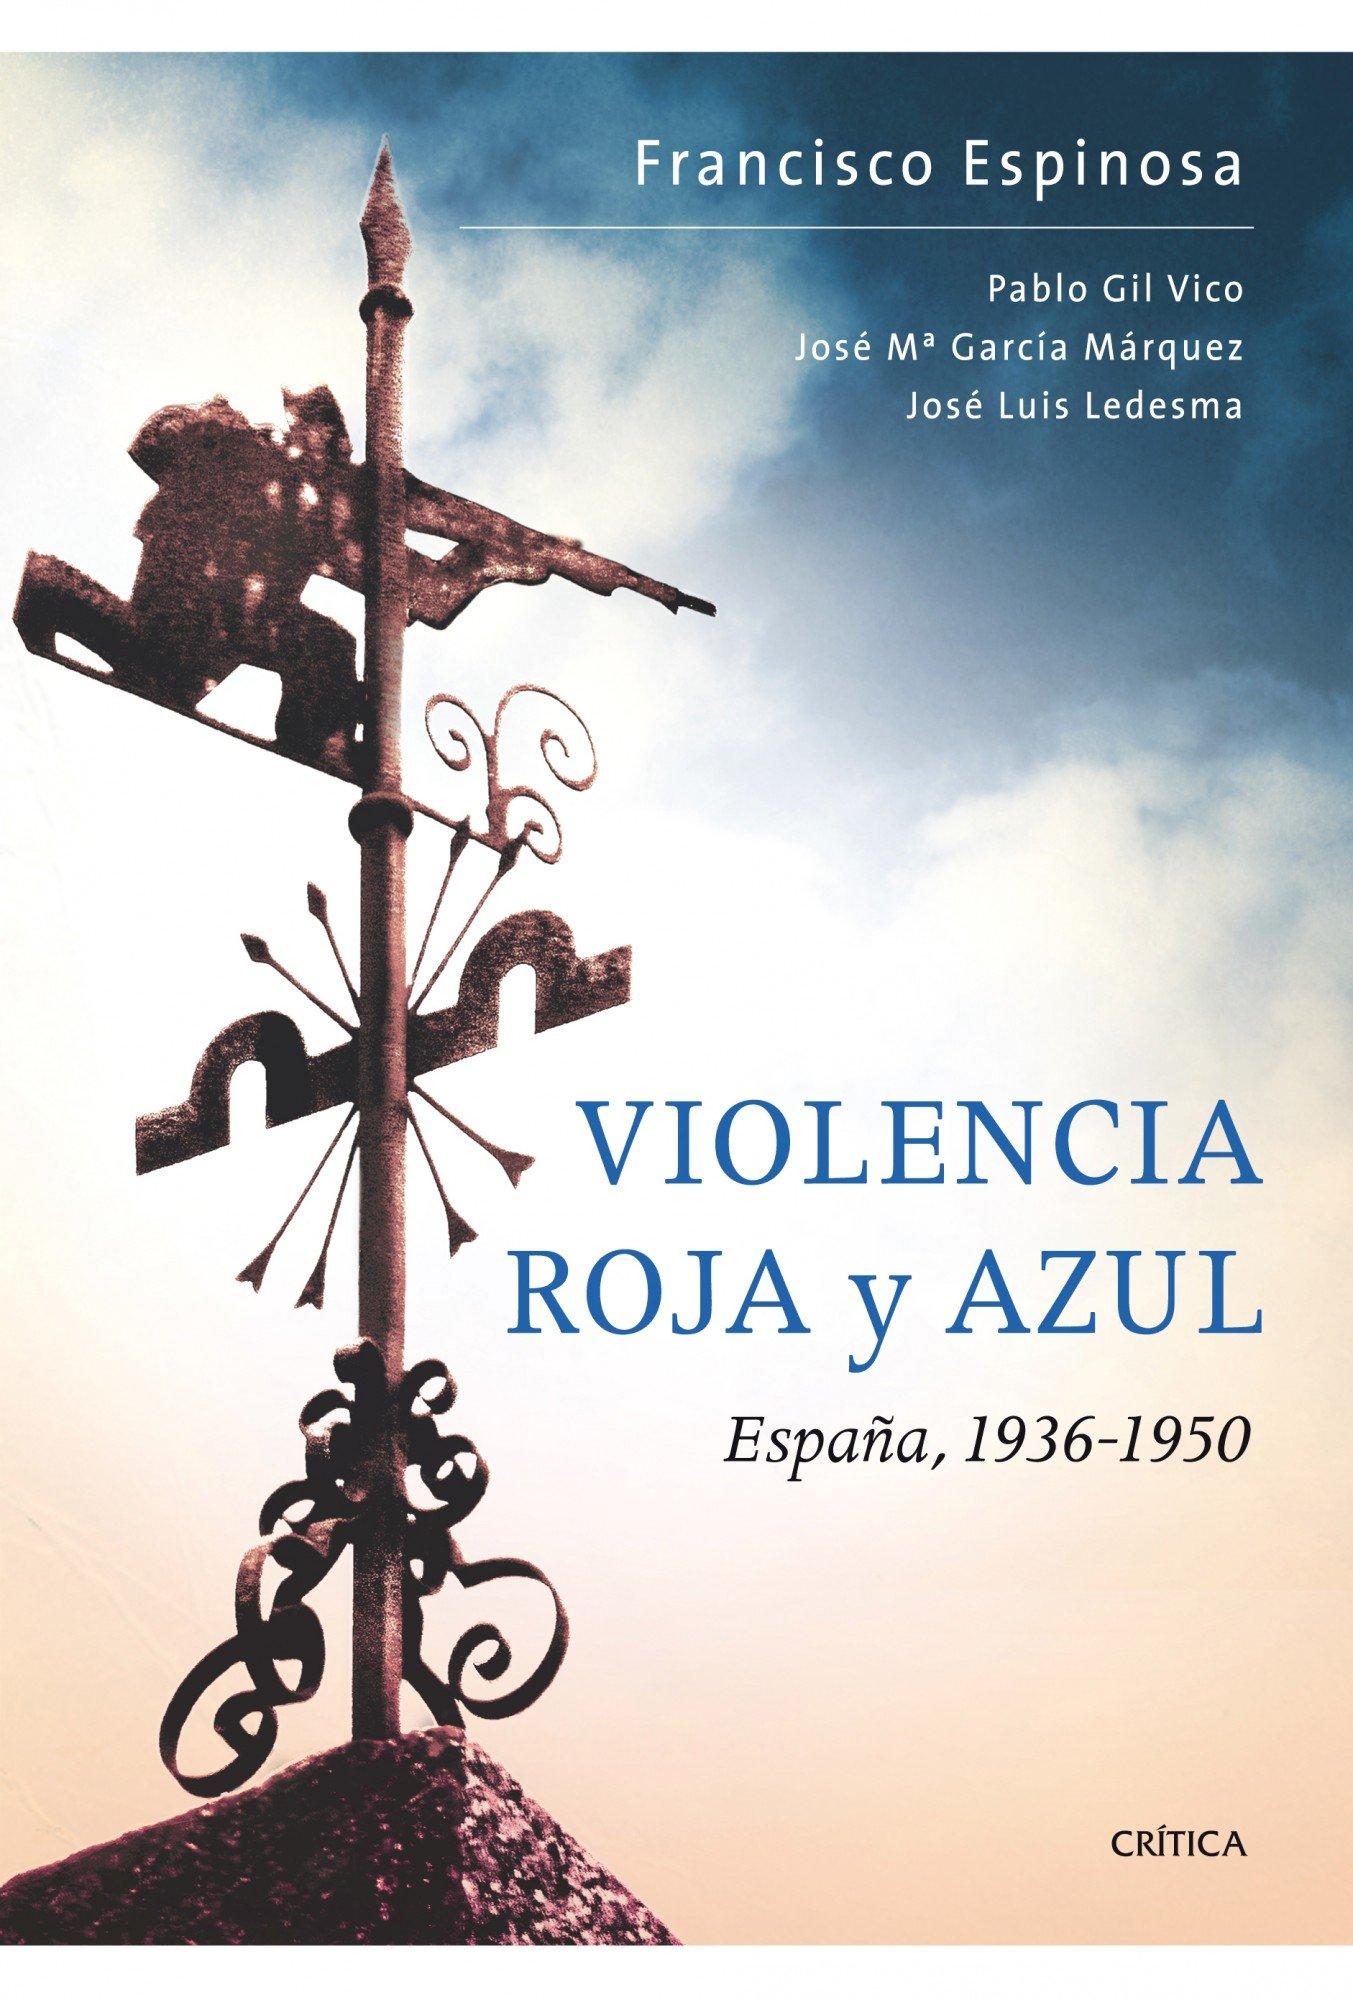 Violencia roja y azul España, 1936-1950: España, 1936-1939 ...